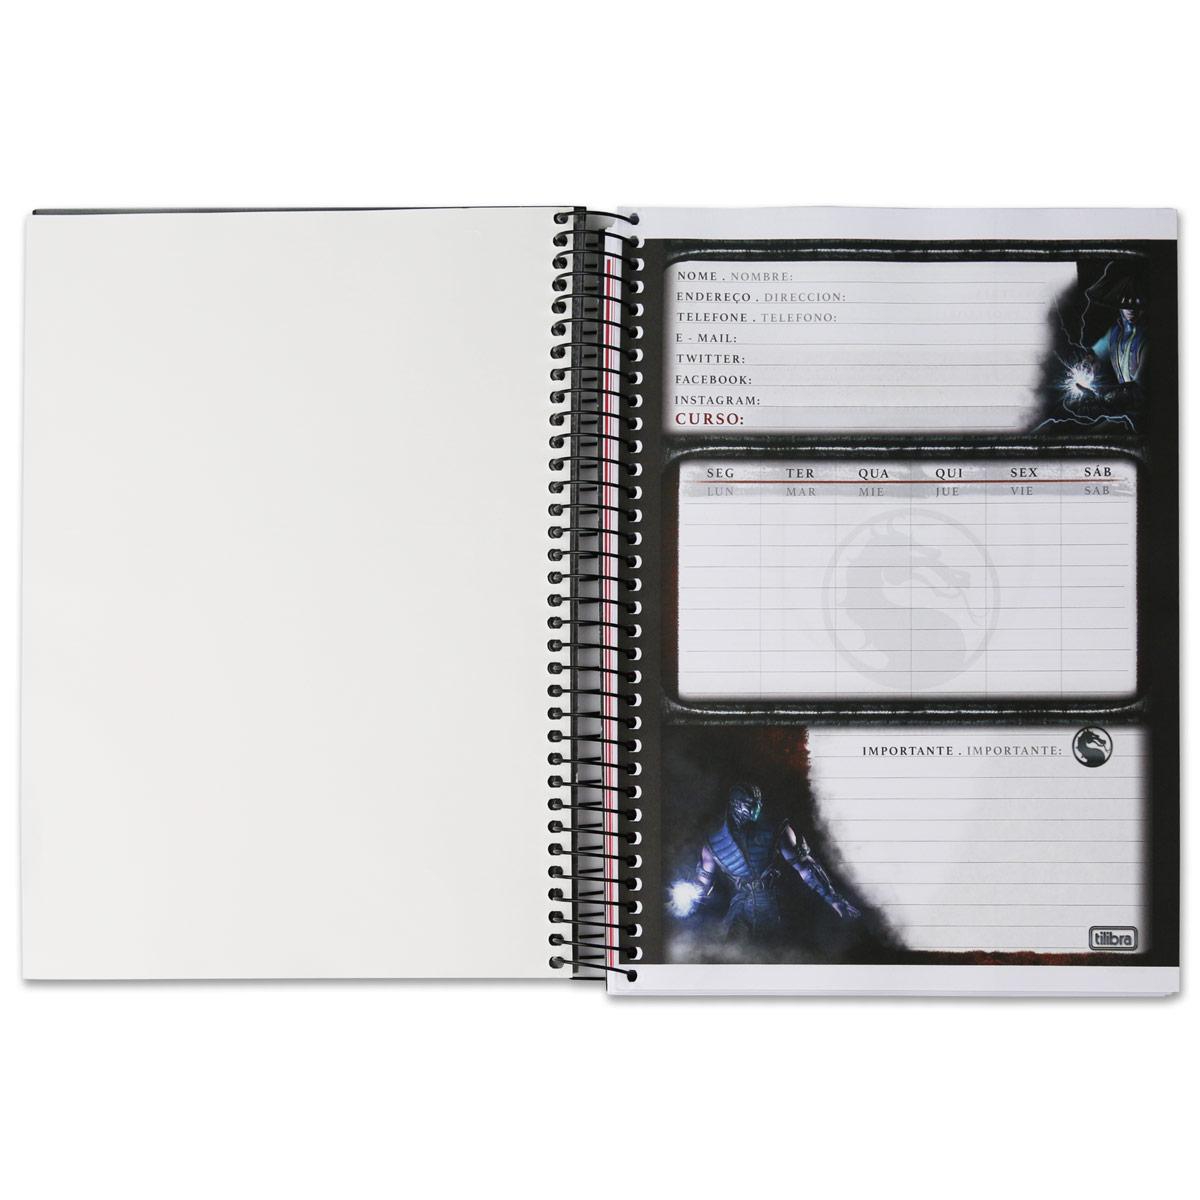 Caderno Mortal Kombat X Scorpion 10 Matérias